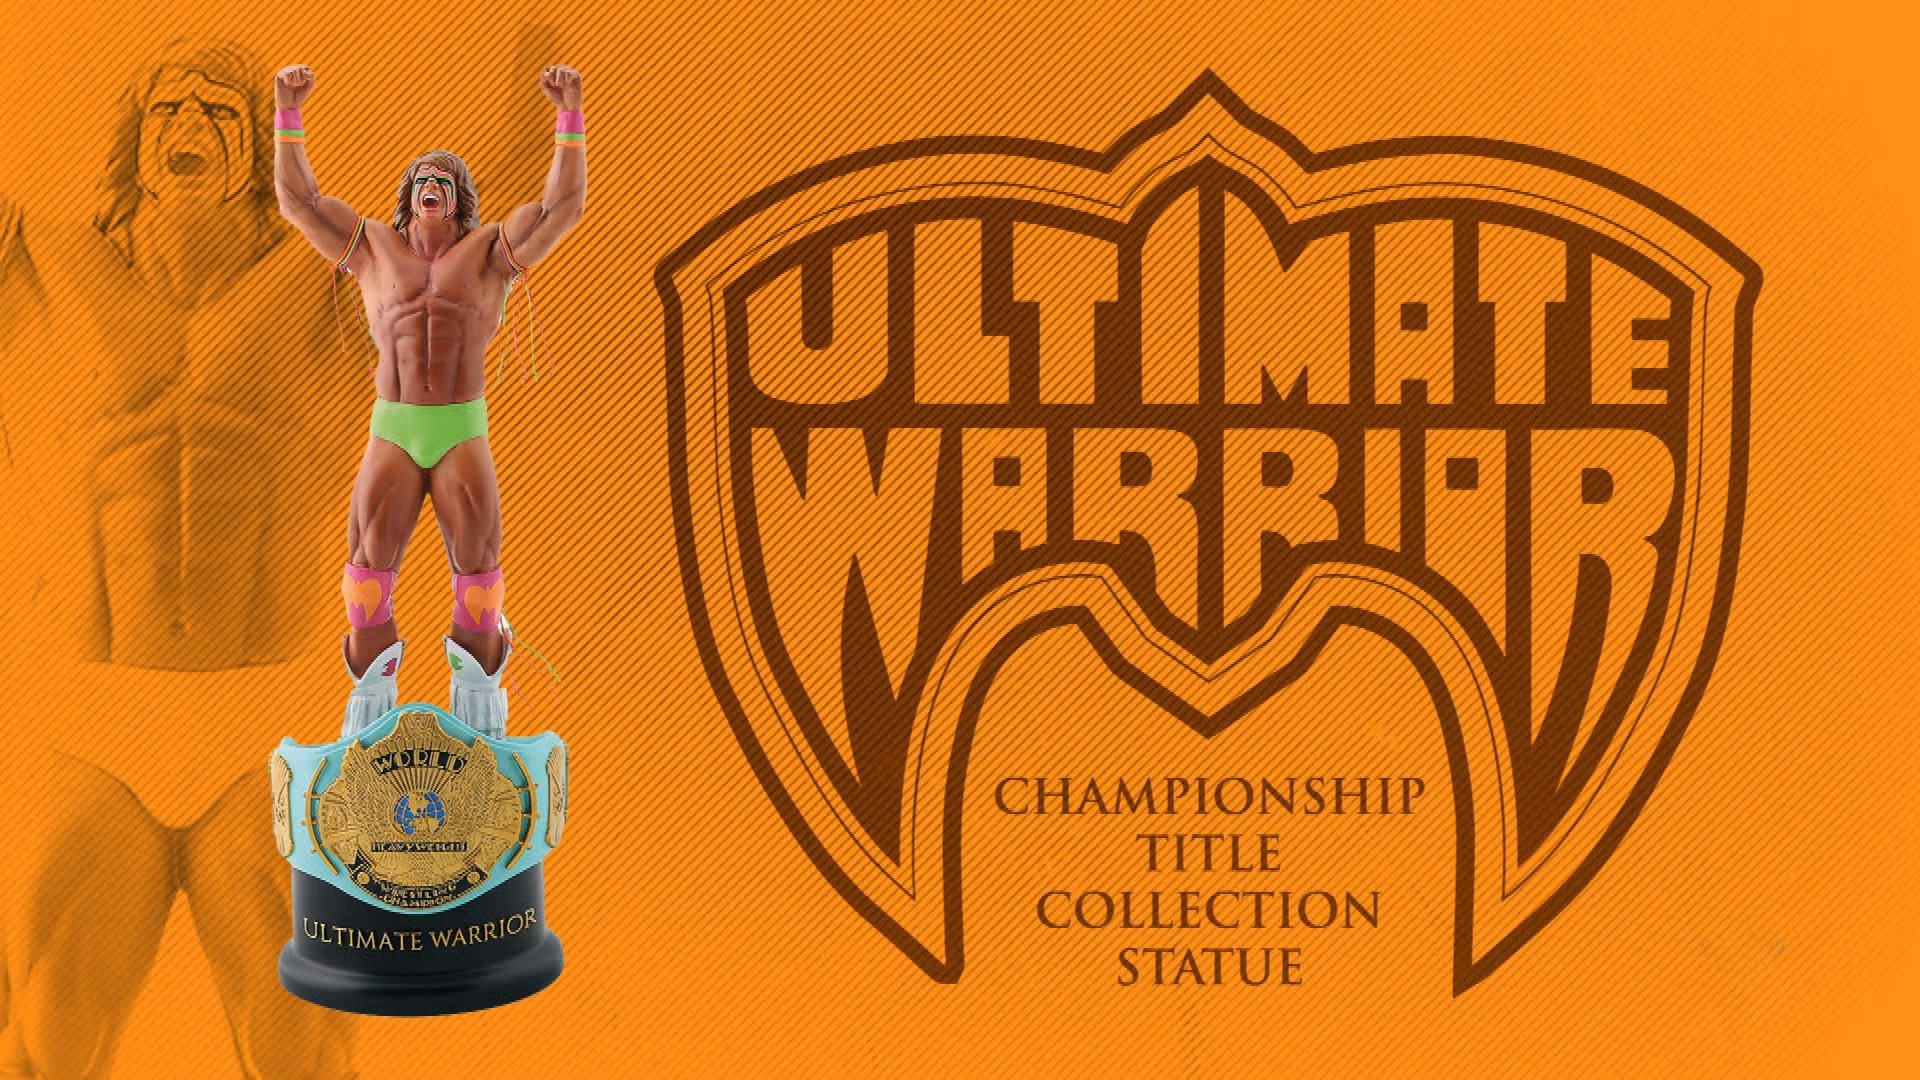 Dana Warrior dévoile la statue exclusive Ultimate Warrior Championship Title Series